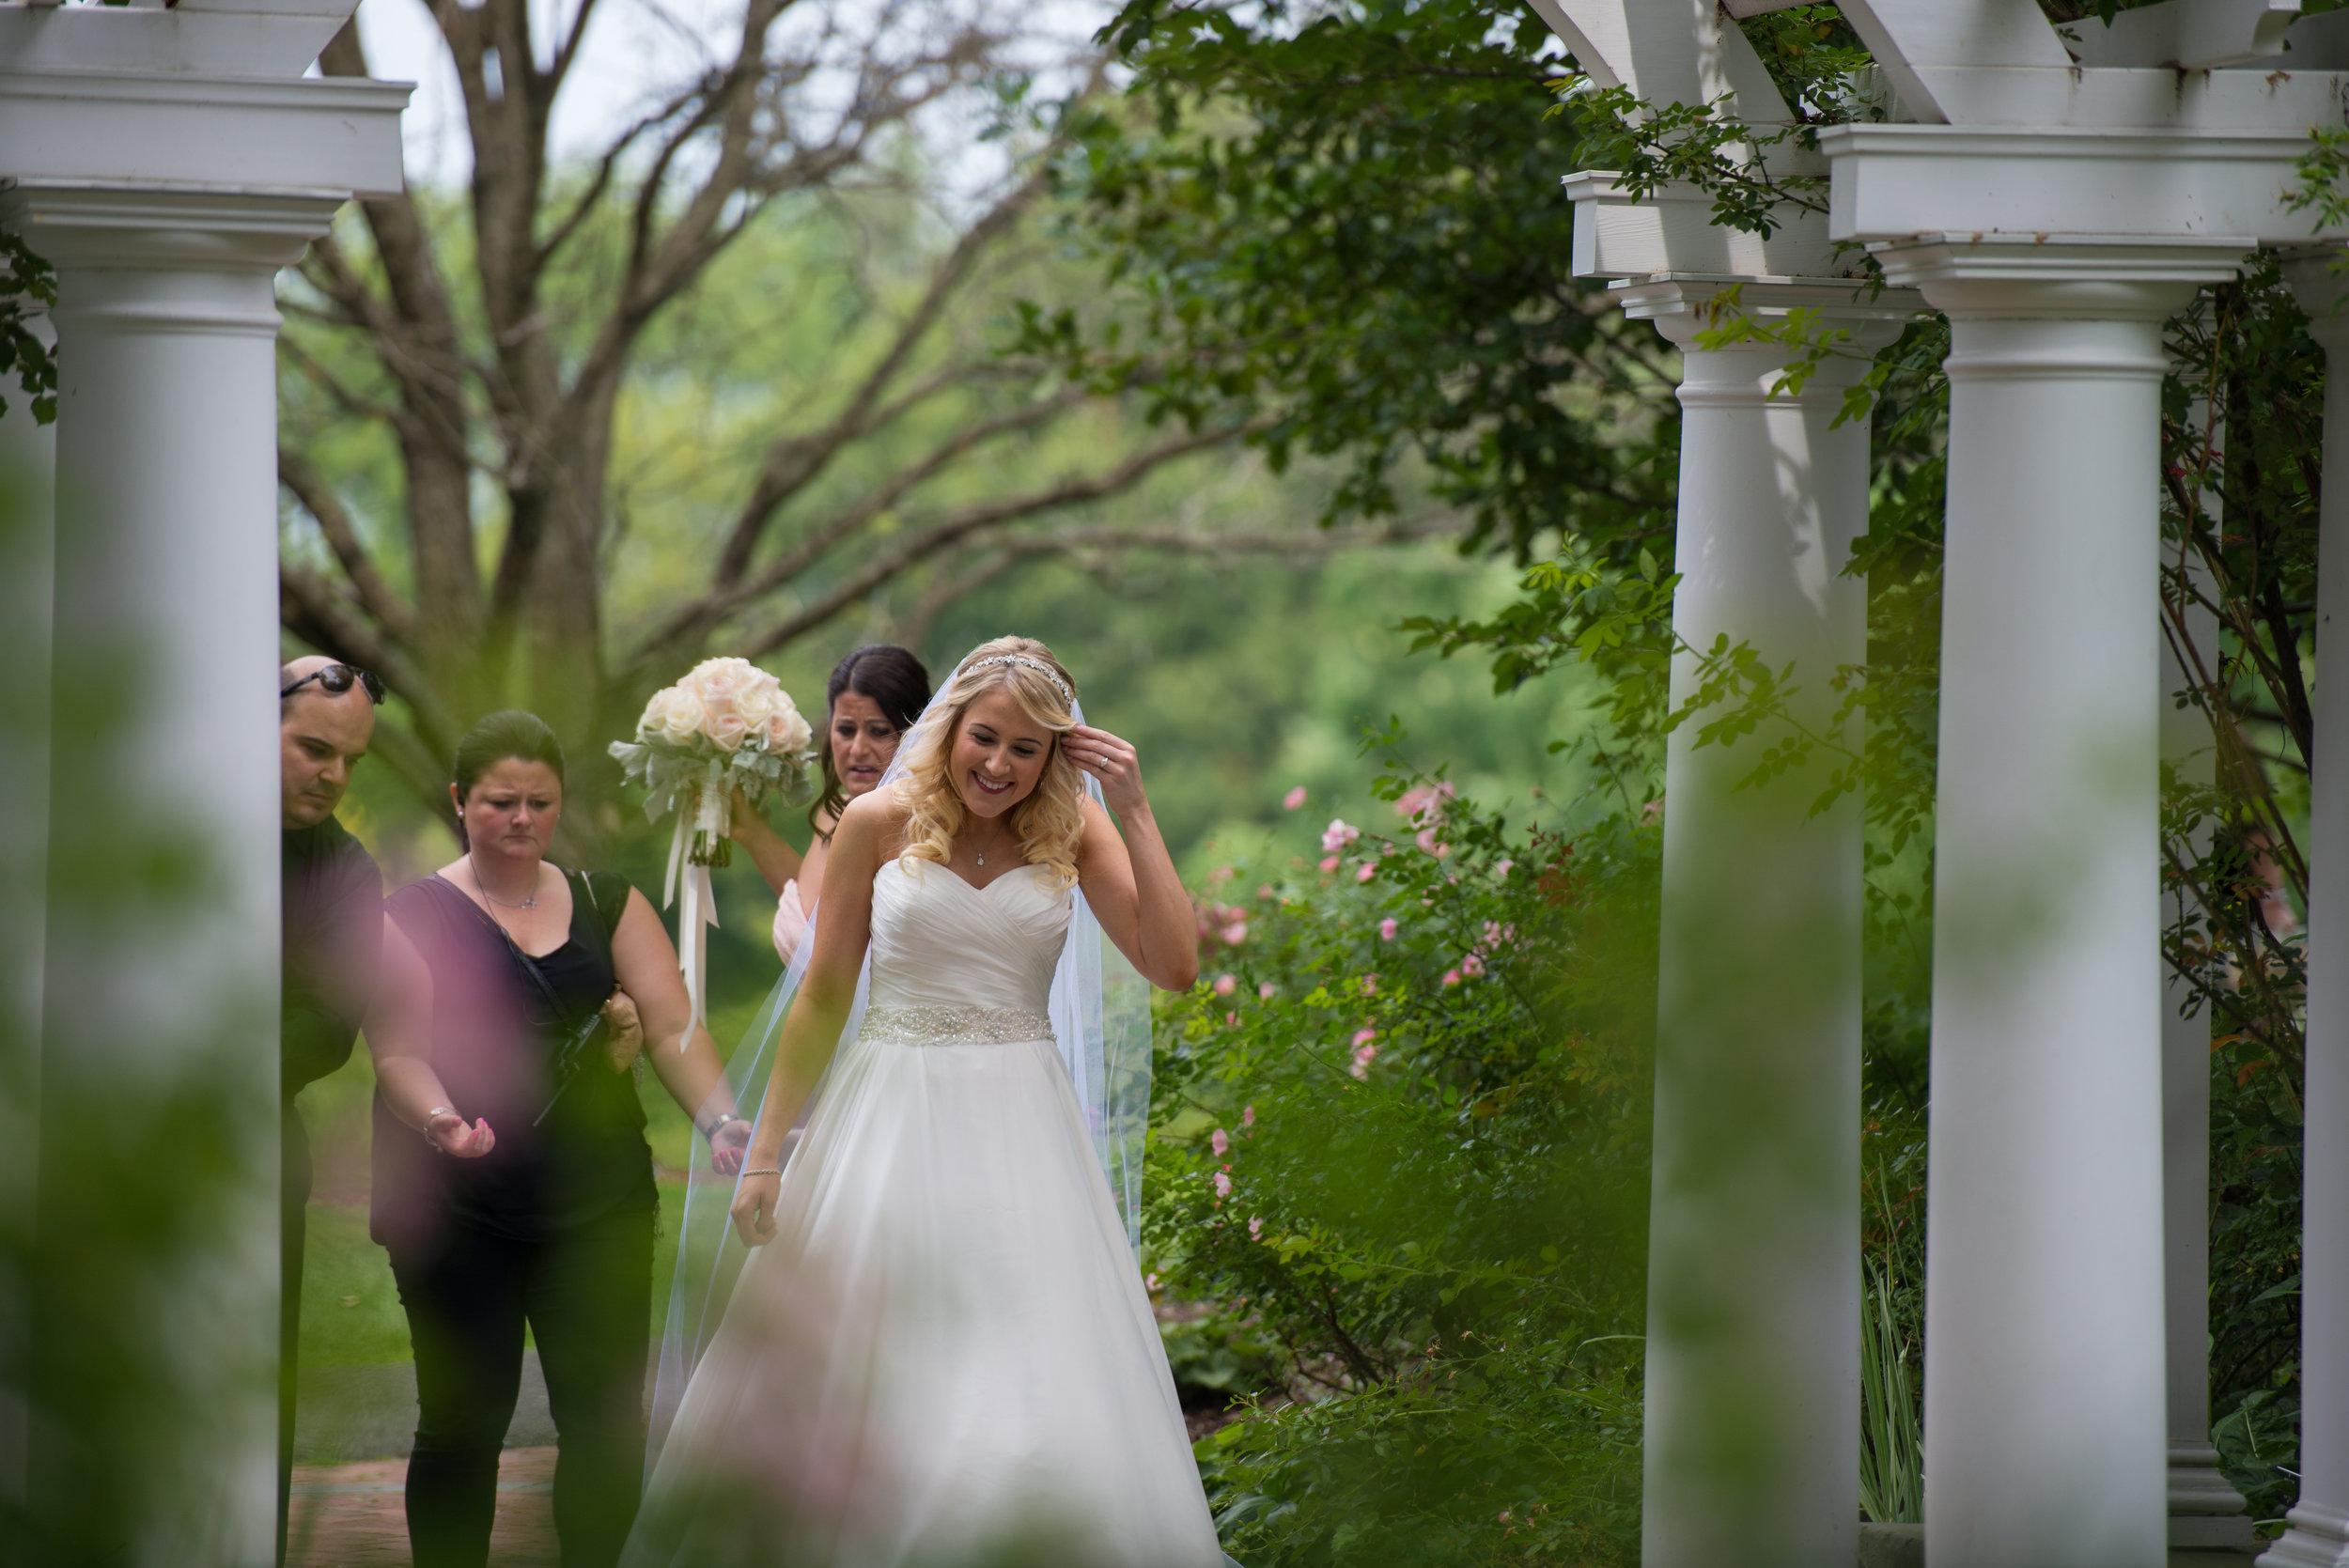 Wedding First Look Photos00908.jpg